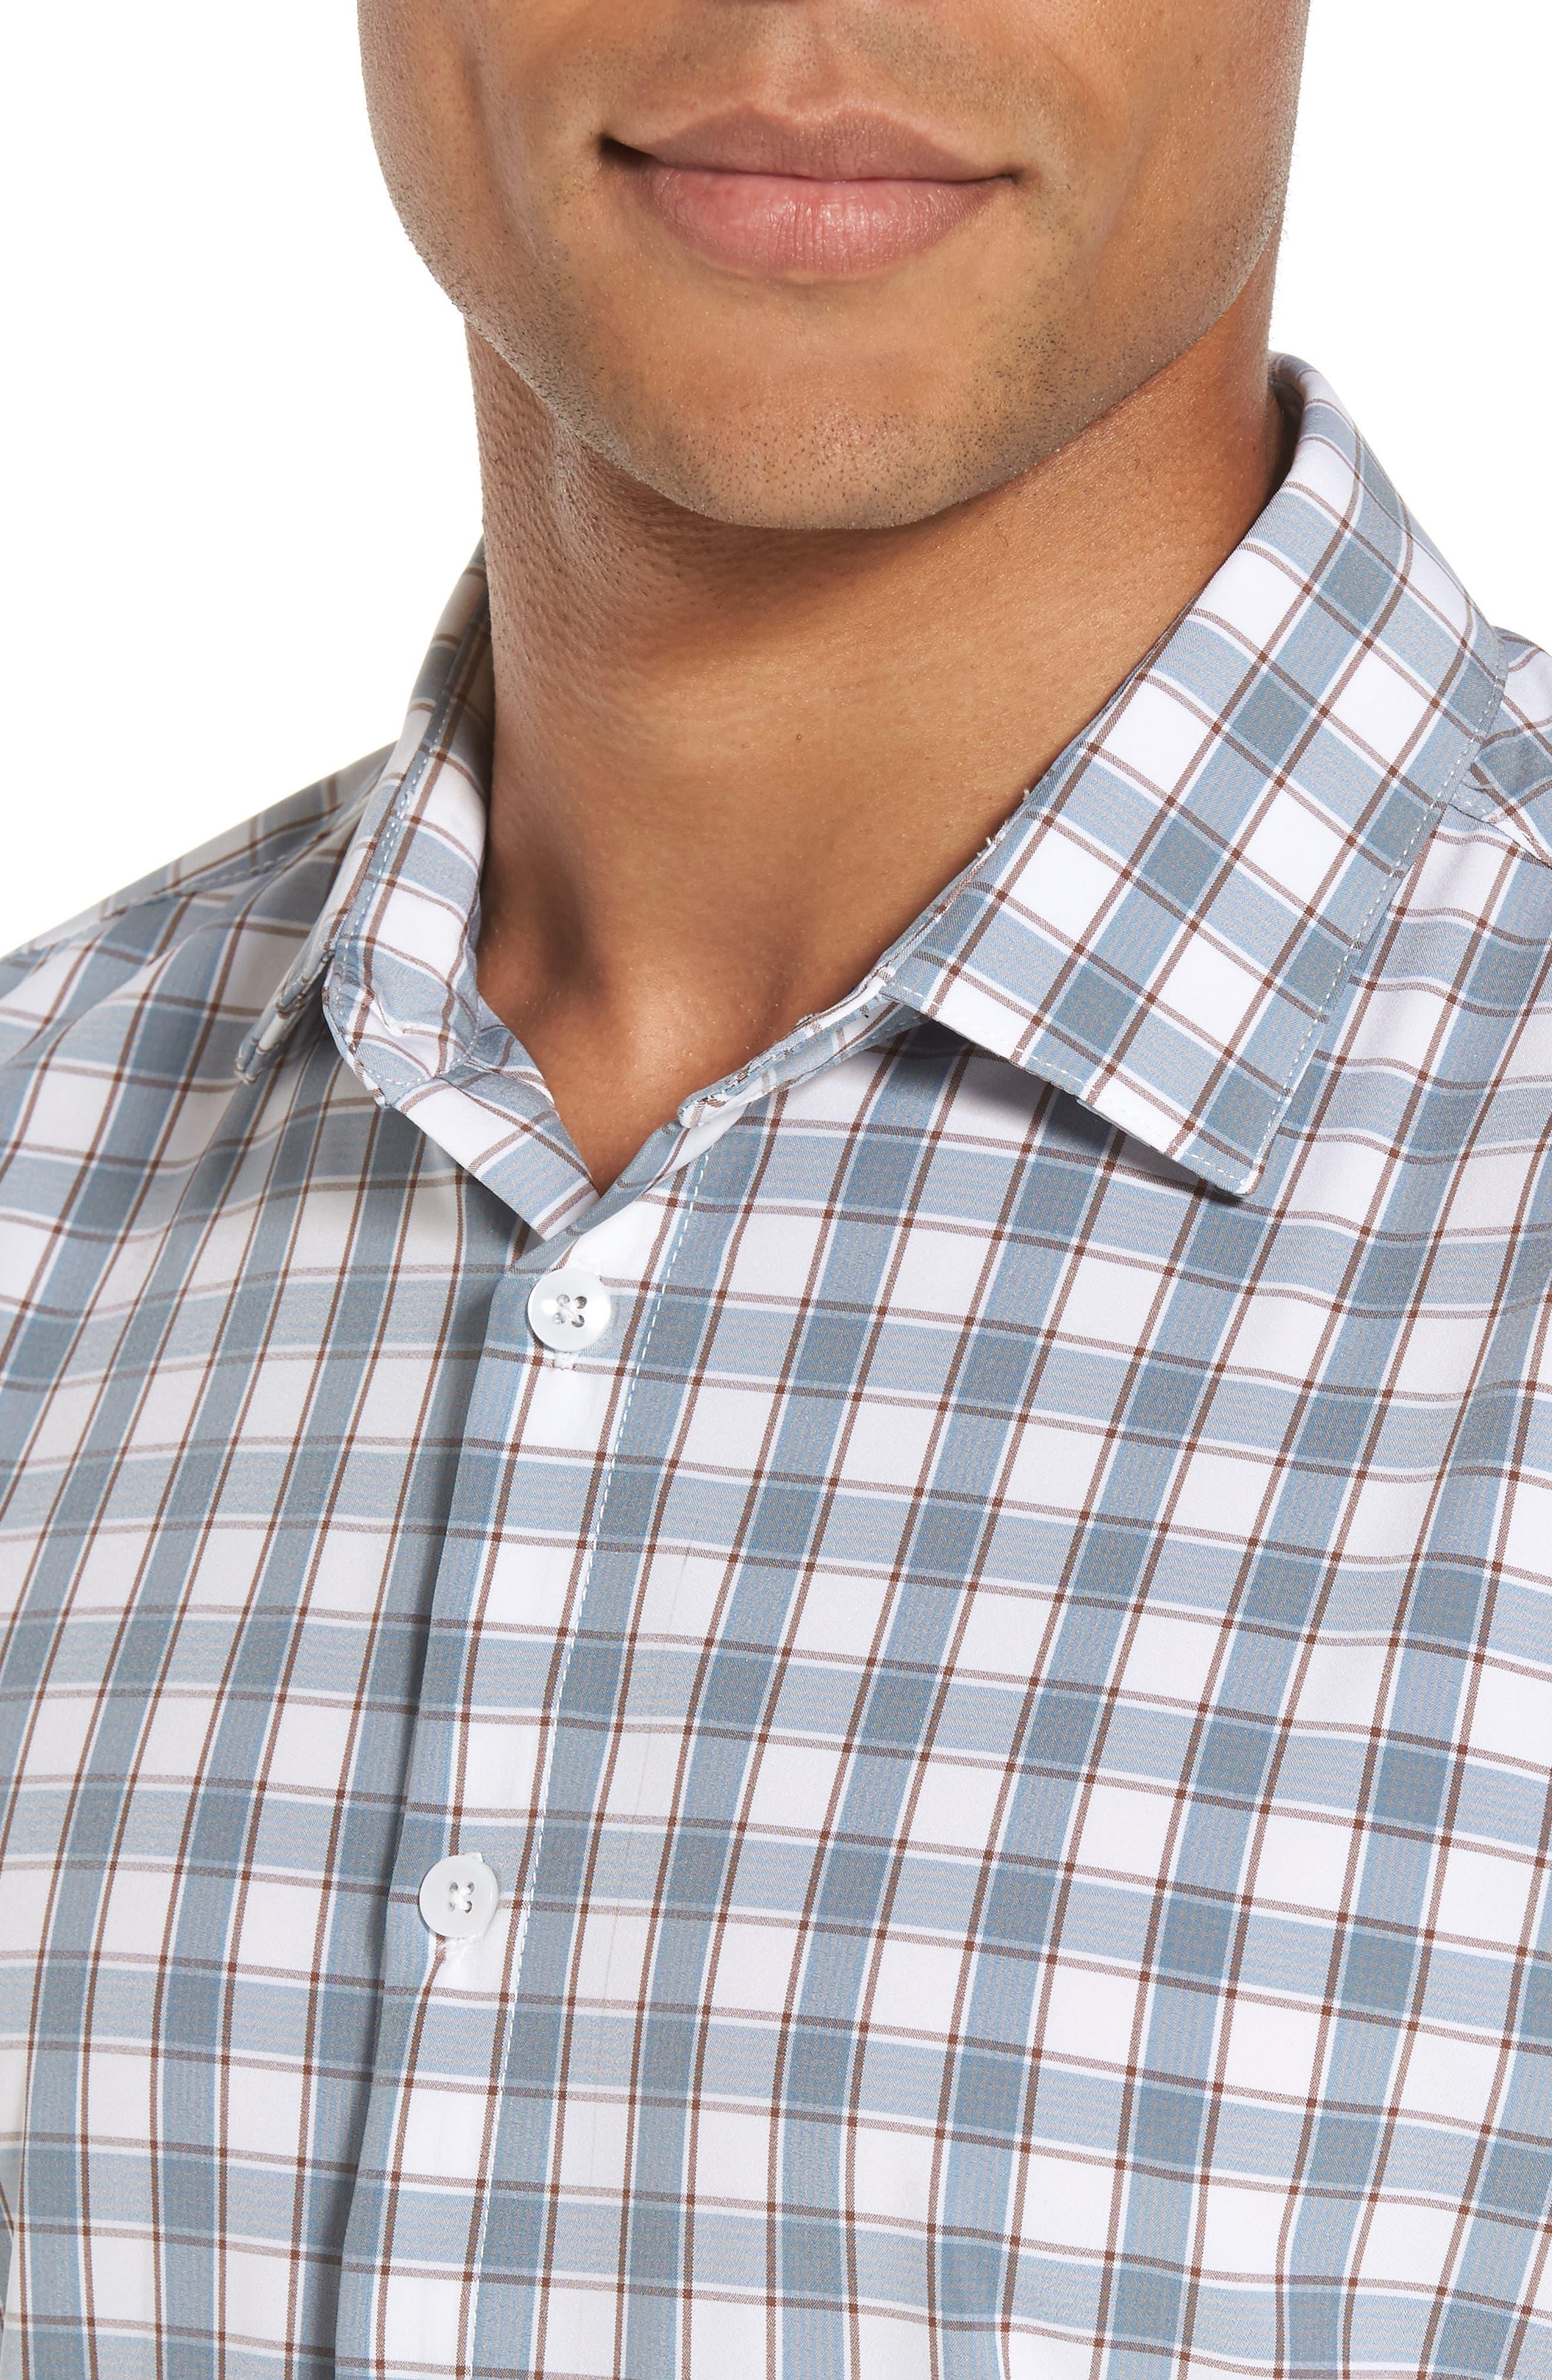 Covington Blue Shadow & Toffee Check Sport Shirt,                             Alternate thumbnail 4, color,                             400